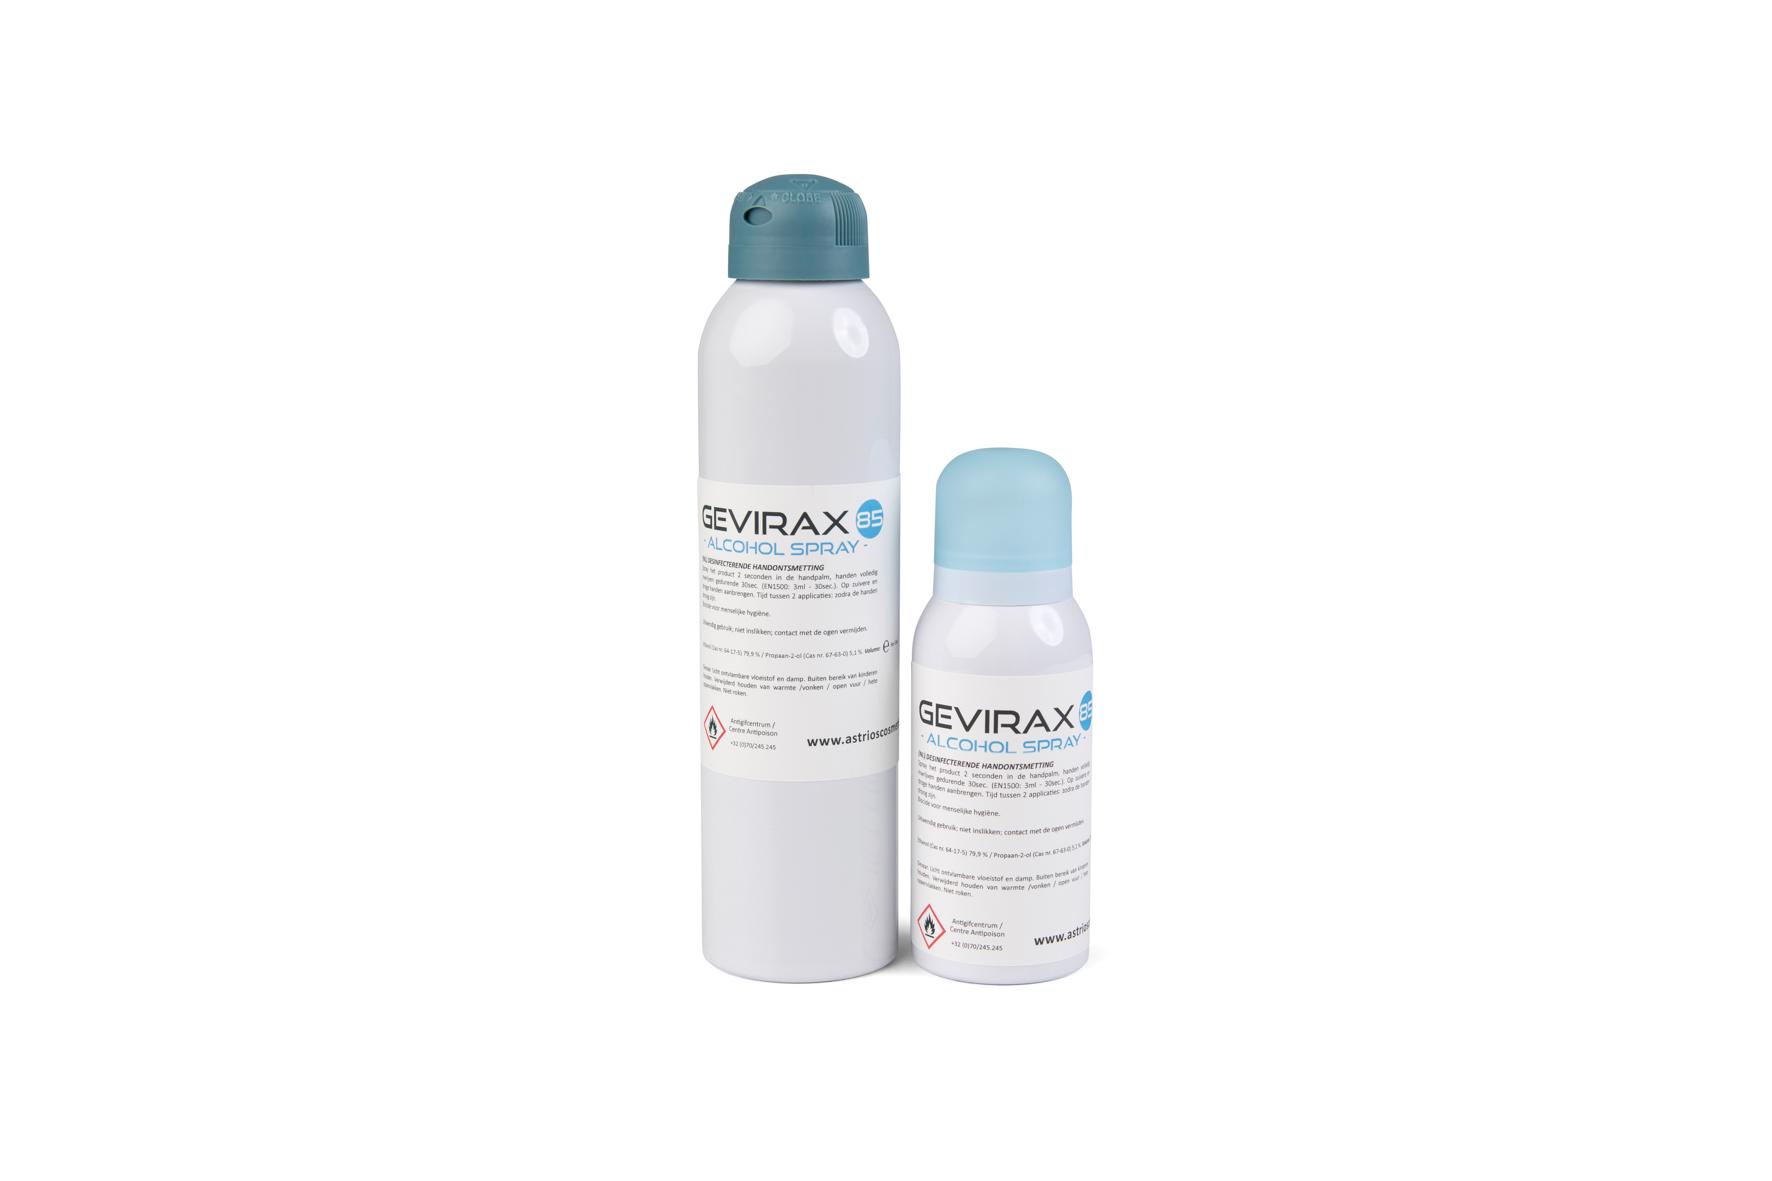 Alcohol Spray Gevirax